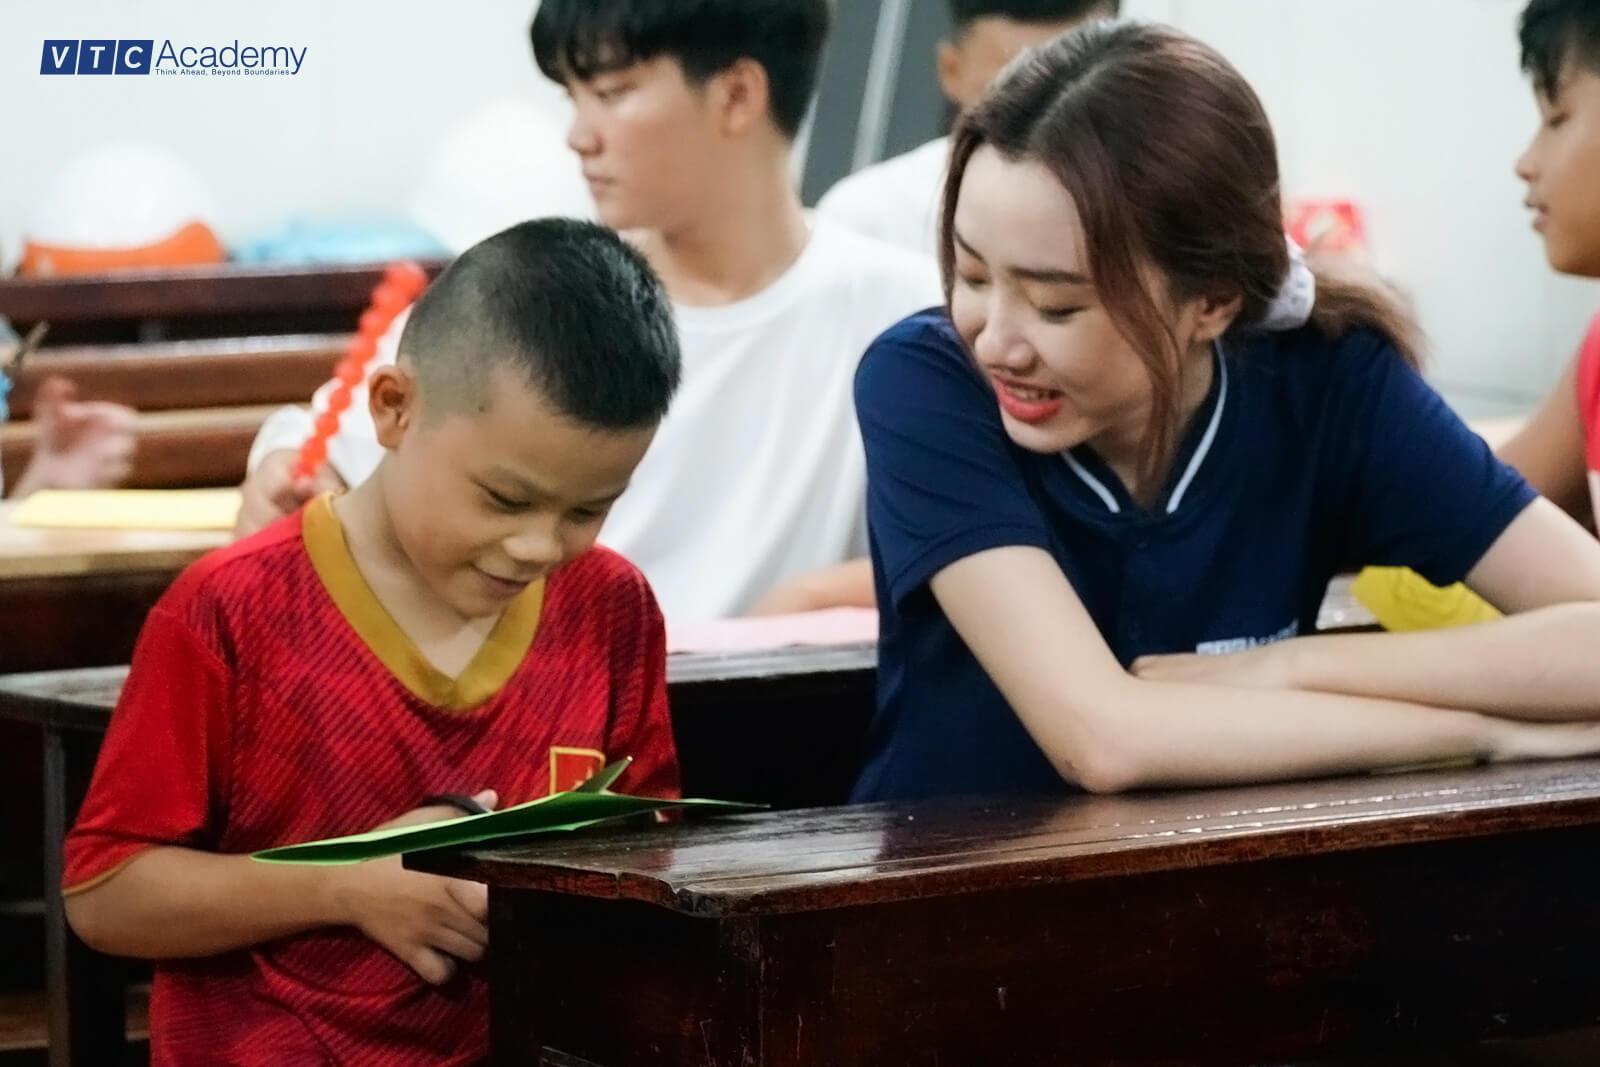 VTC Academy HCMC organizes Mid-Autumn Festival 2020 for children in Tan Binh Shelter